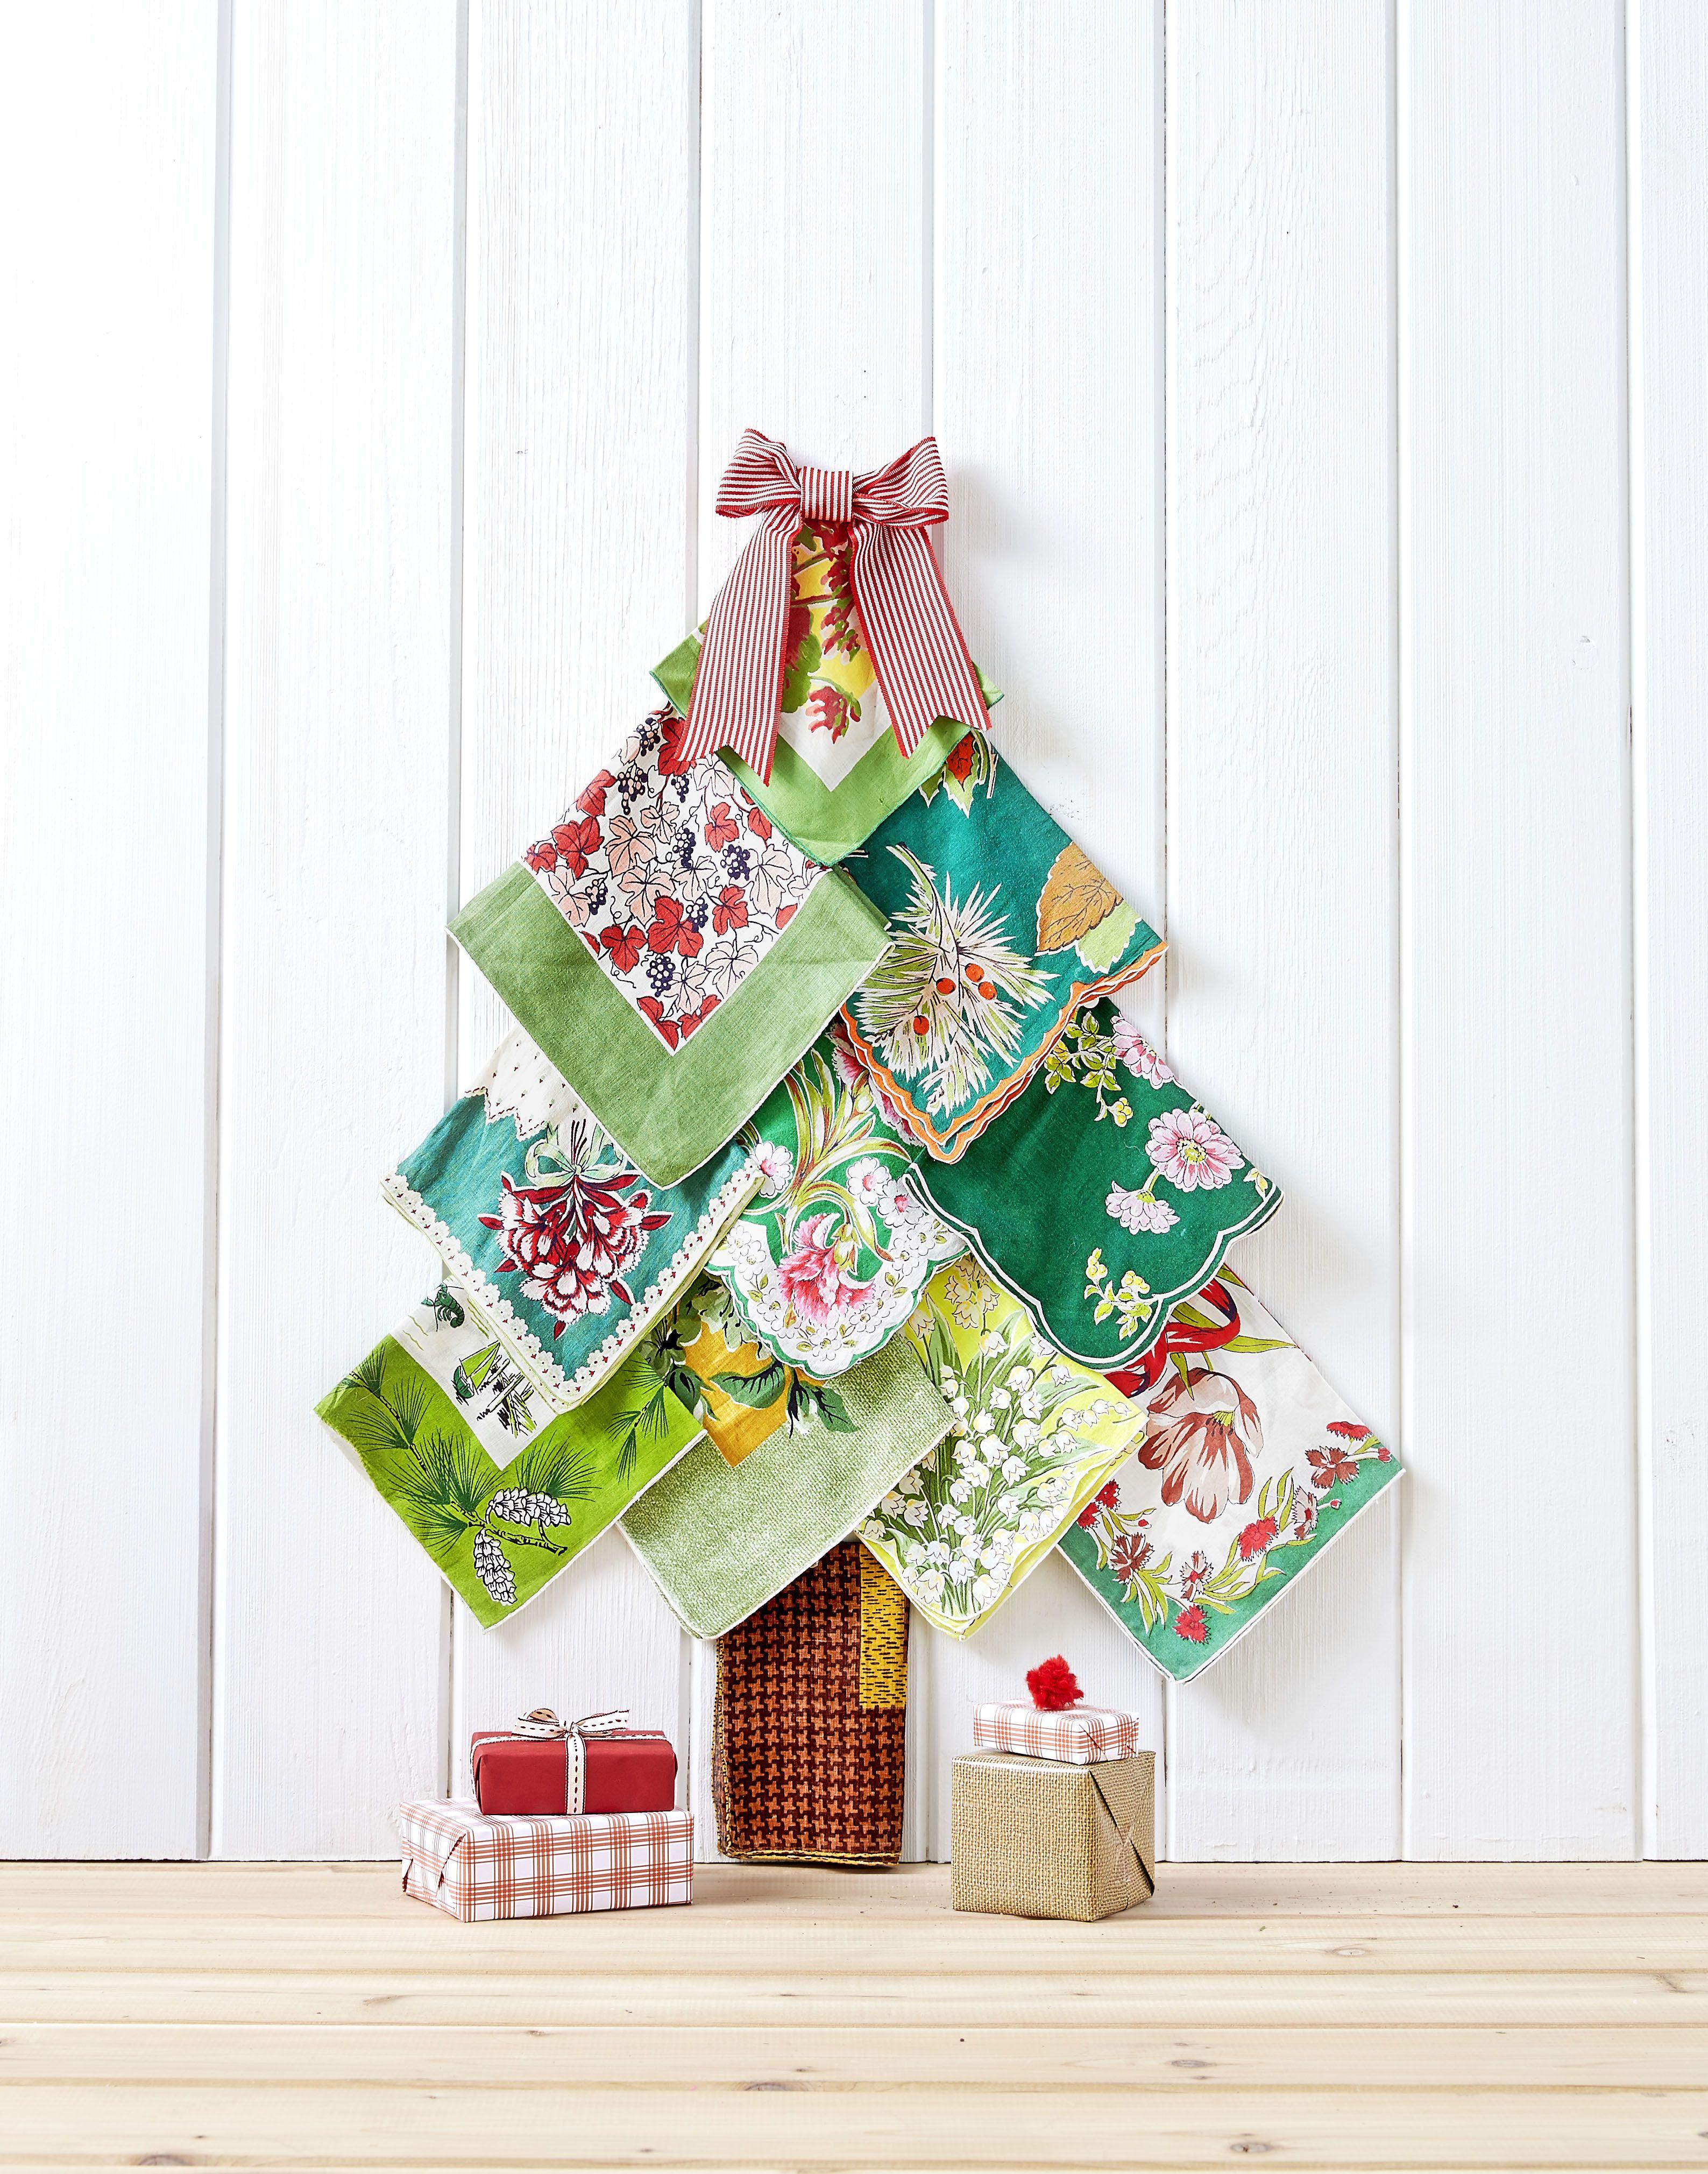 Free Printable Christmas Ornament Cross Stitch Patterns – Festival - Free Printable Christmas Ornament Cross Stitch Patterns